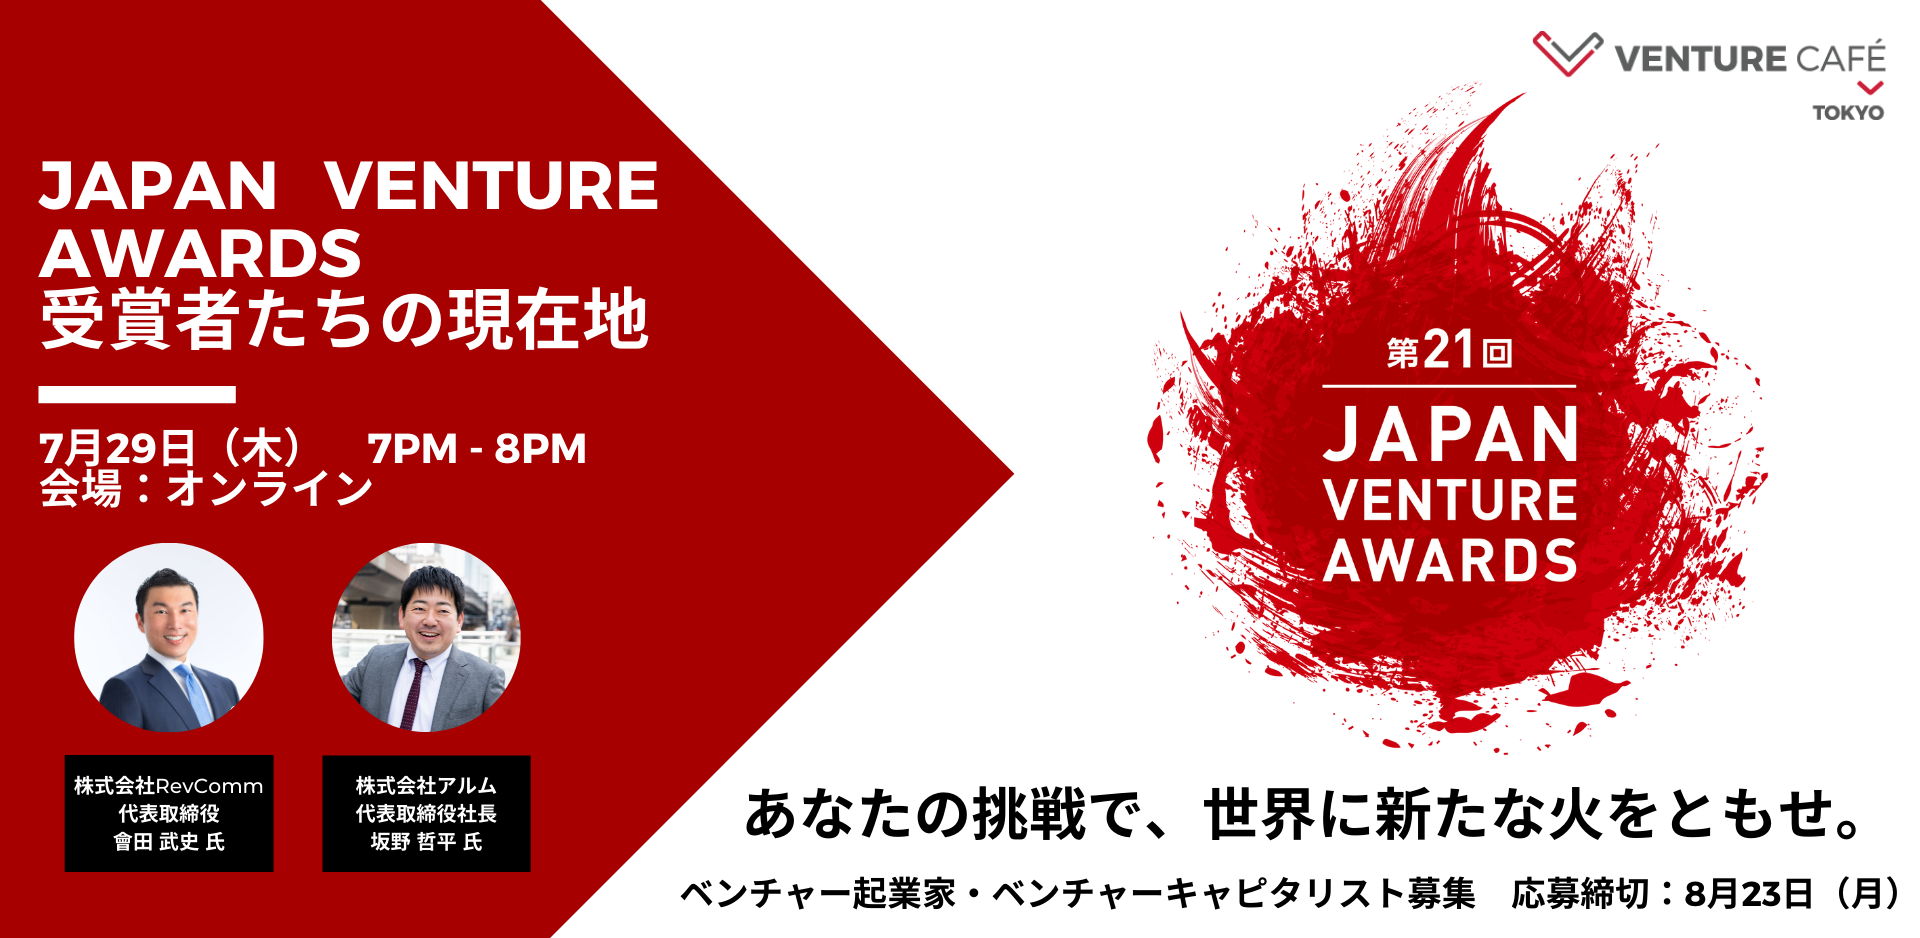 Japan Venture Awards受賞者たちの現在地 (2).png